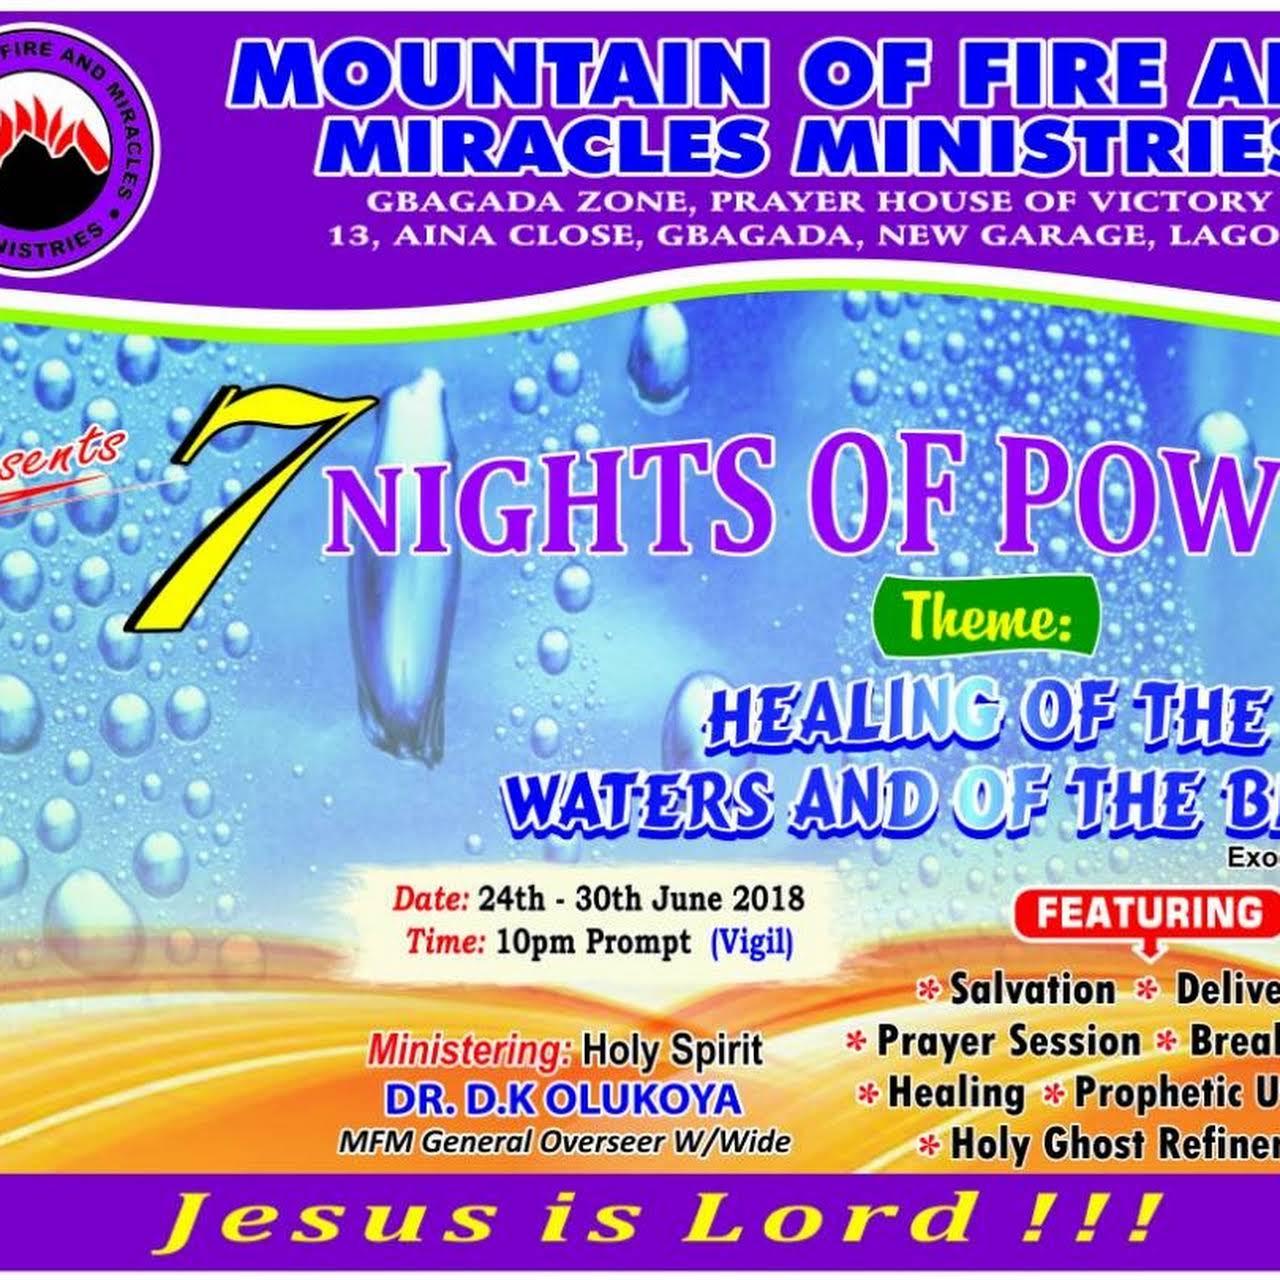 MFM Prayer House of Victory, New Garage - Gbagada, Lagos